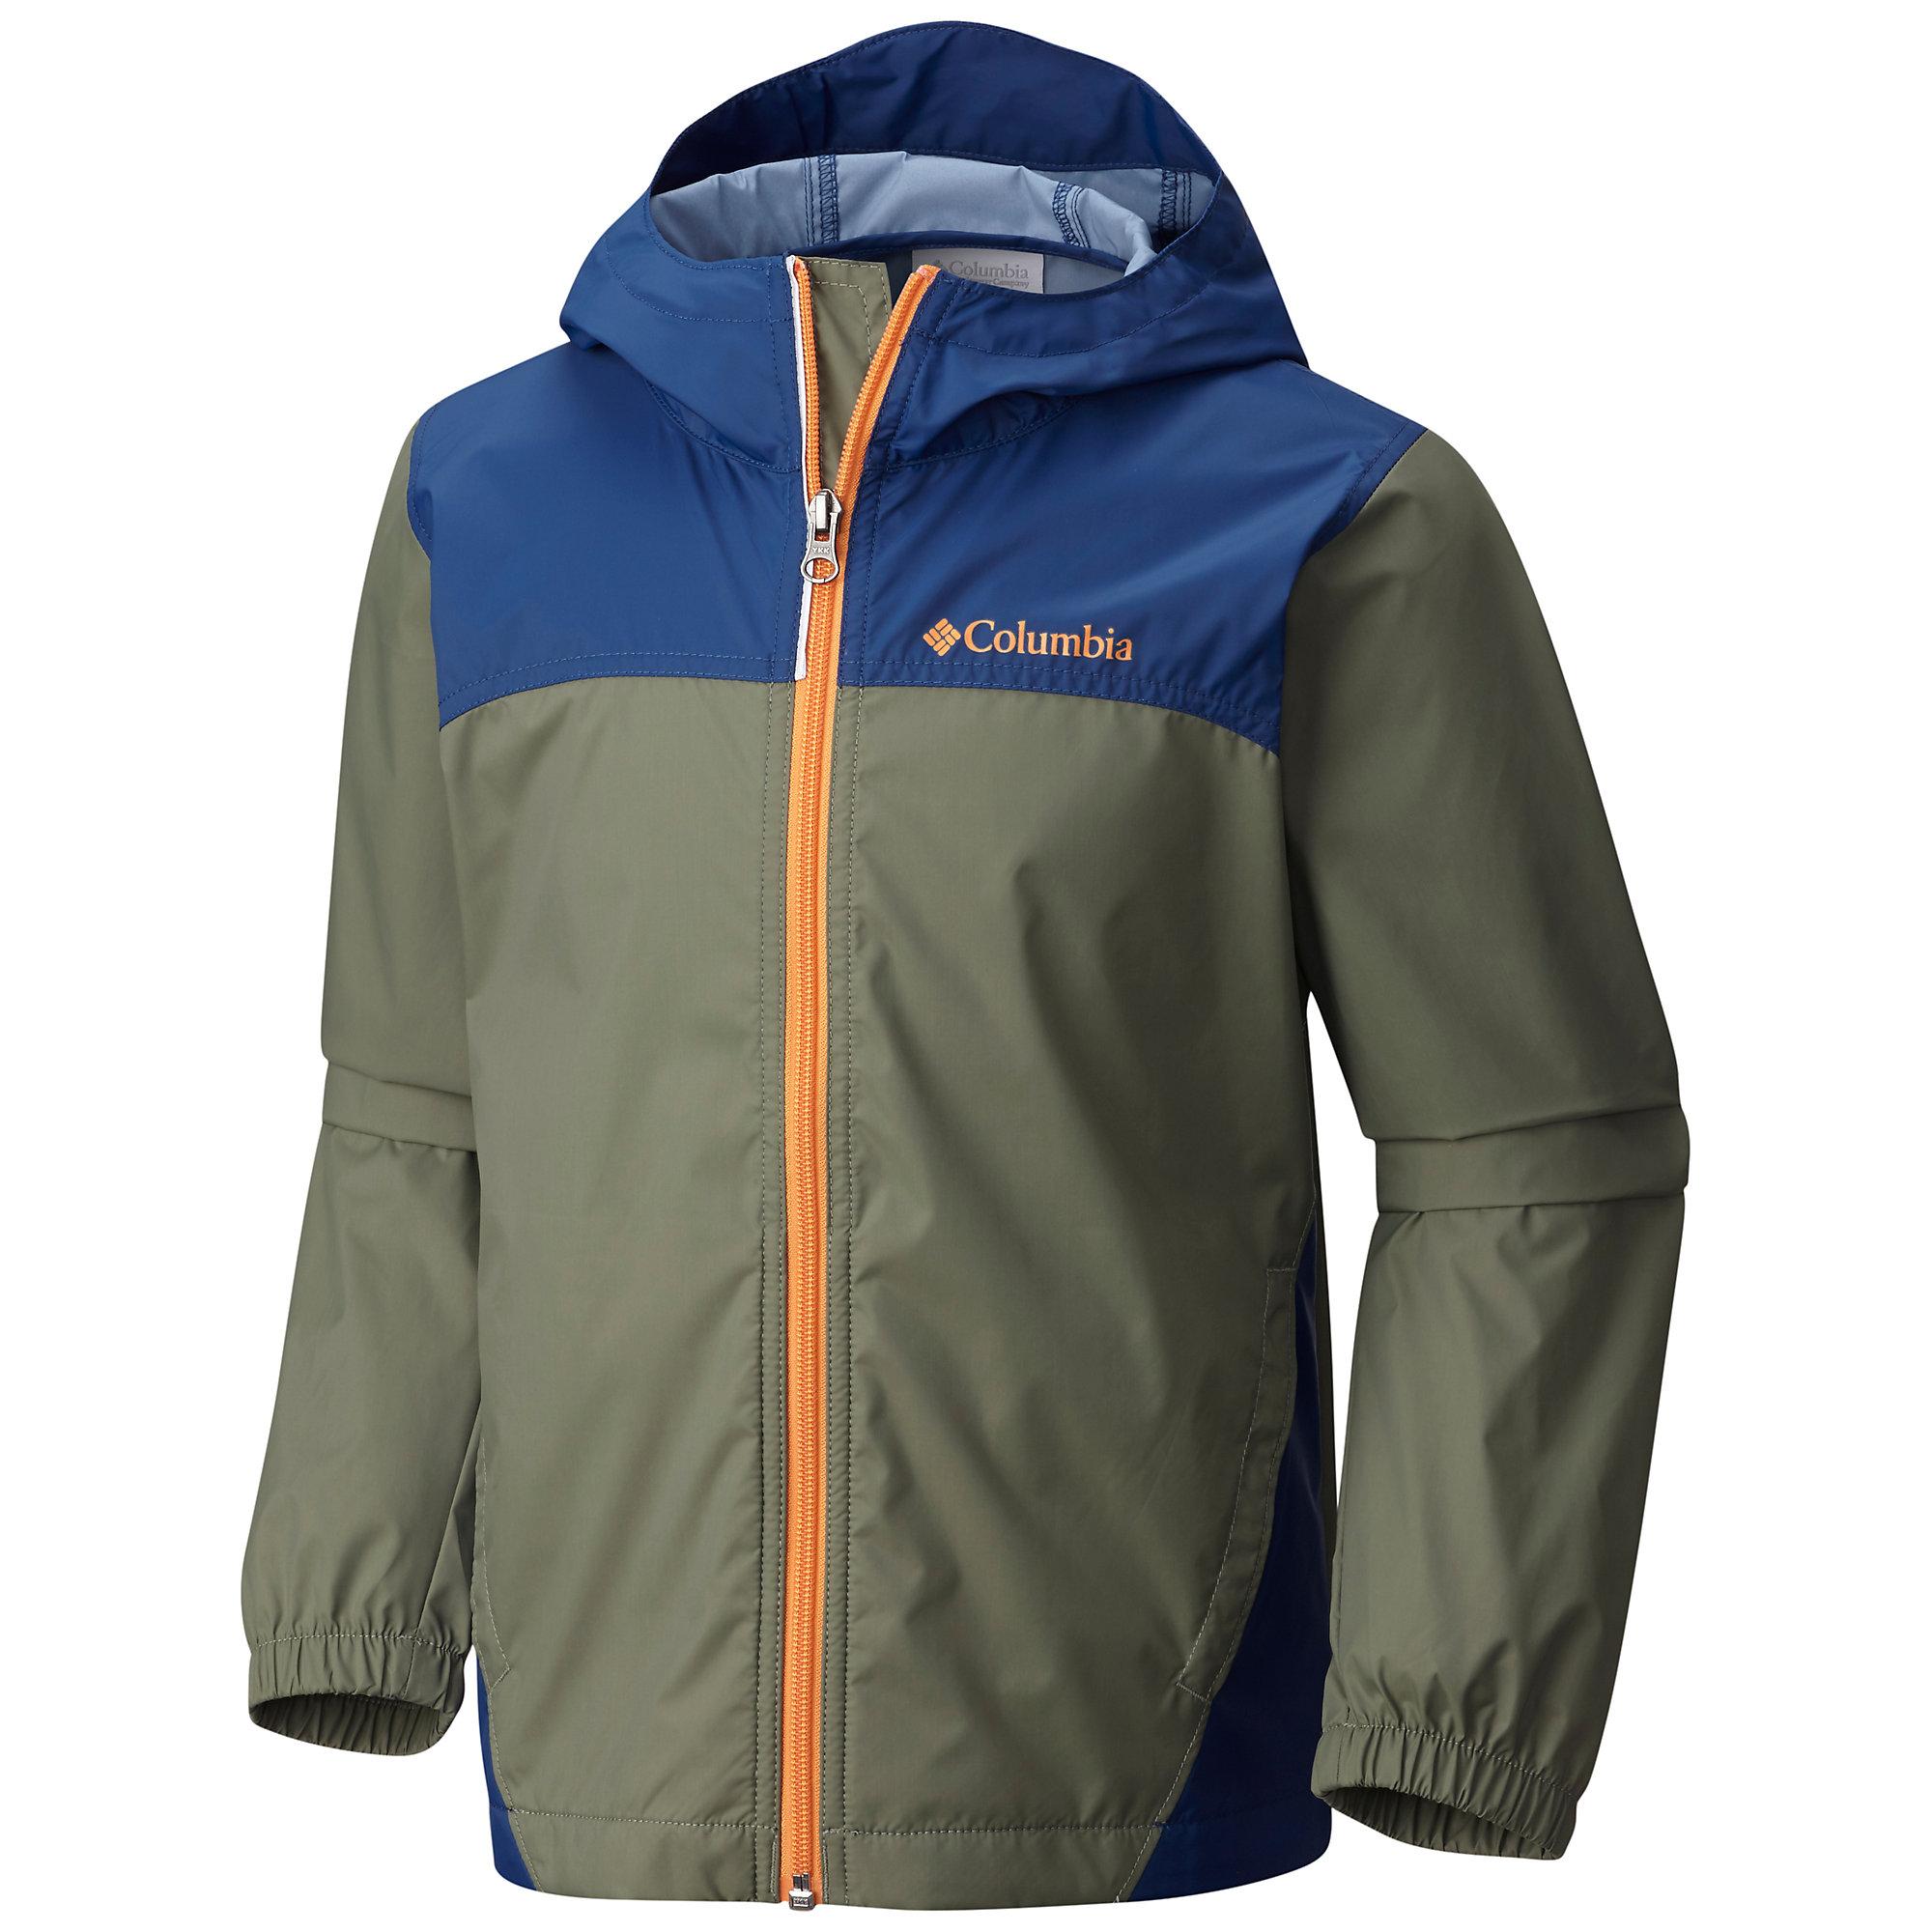 Columbia Glennaker Rain Jacket